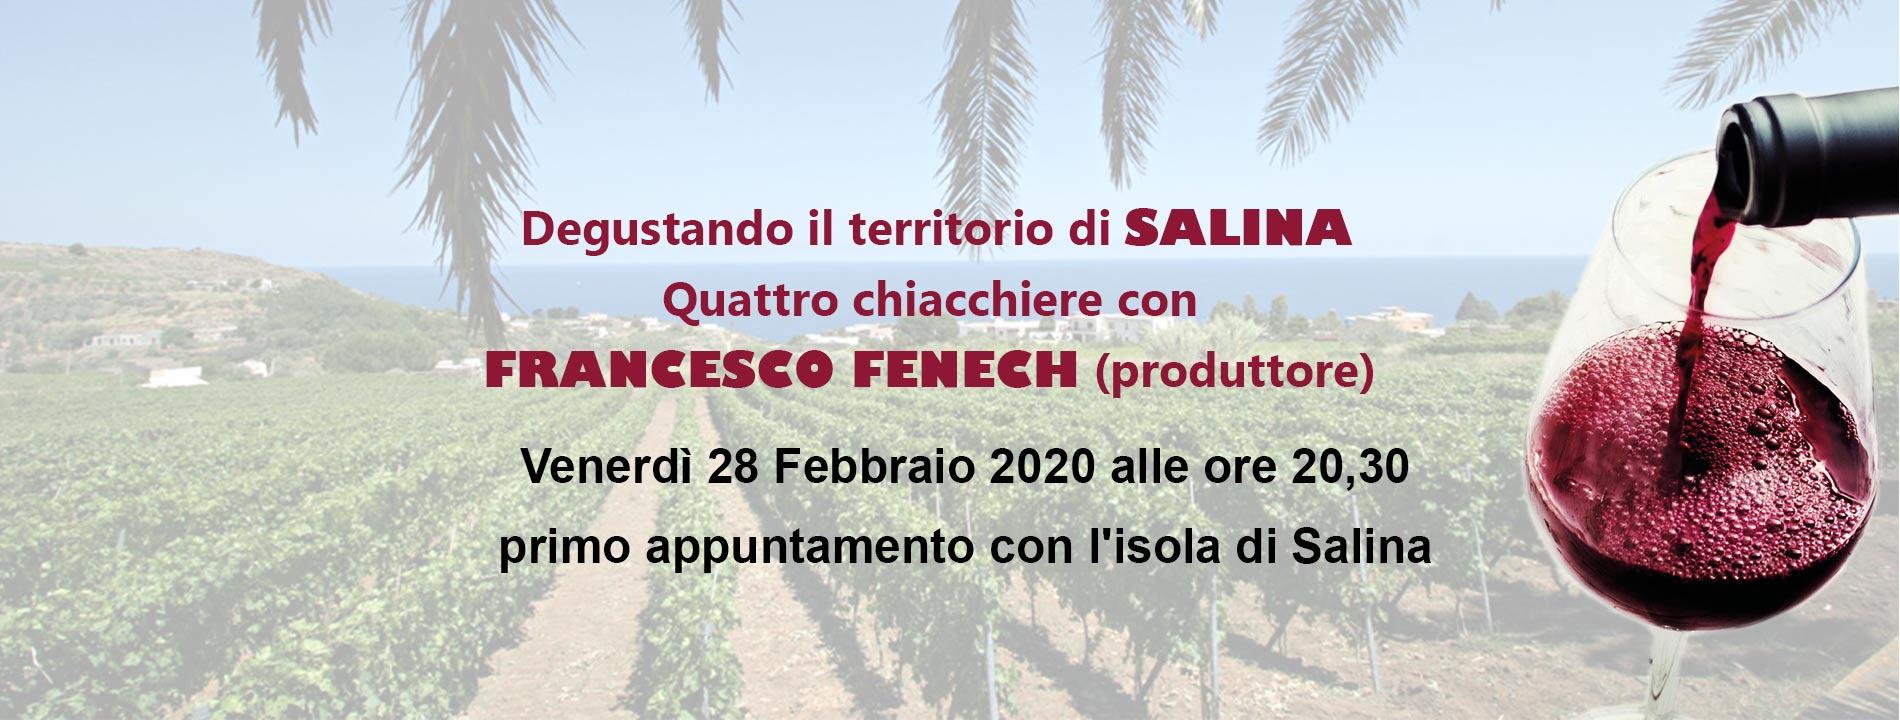 Degustazione Fenech vini